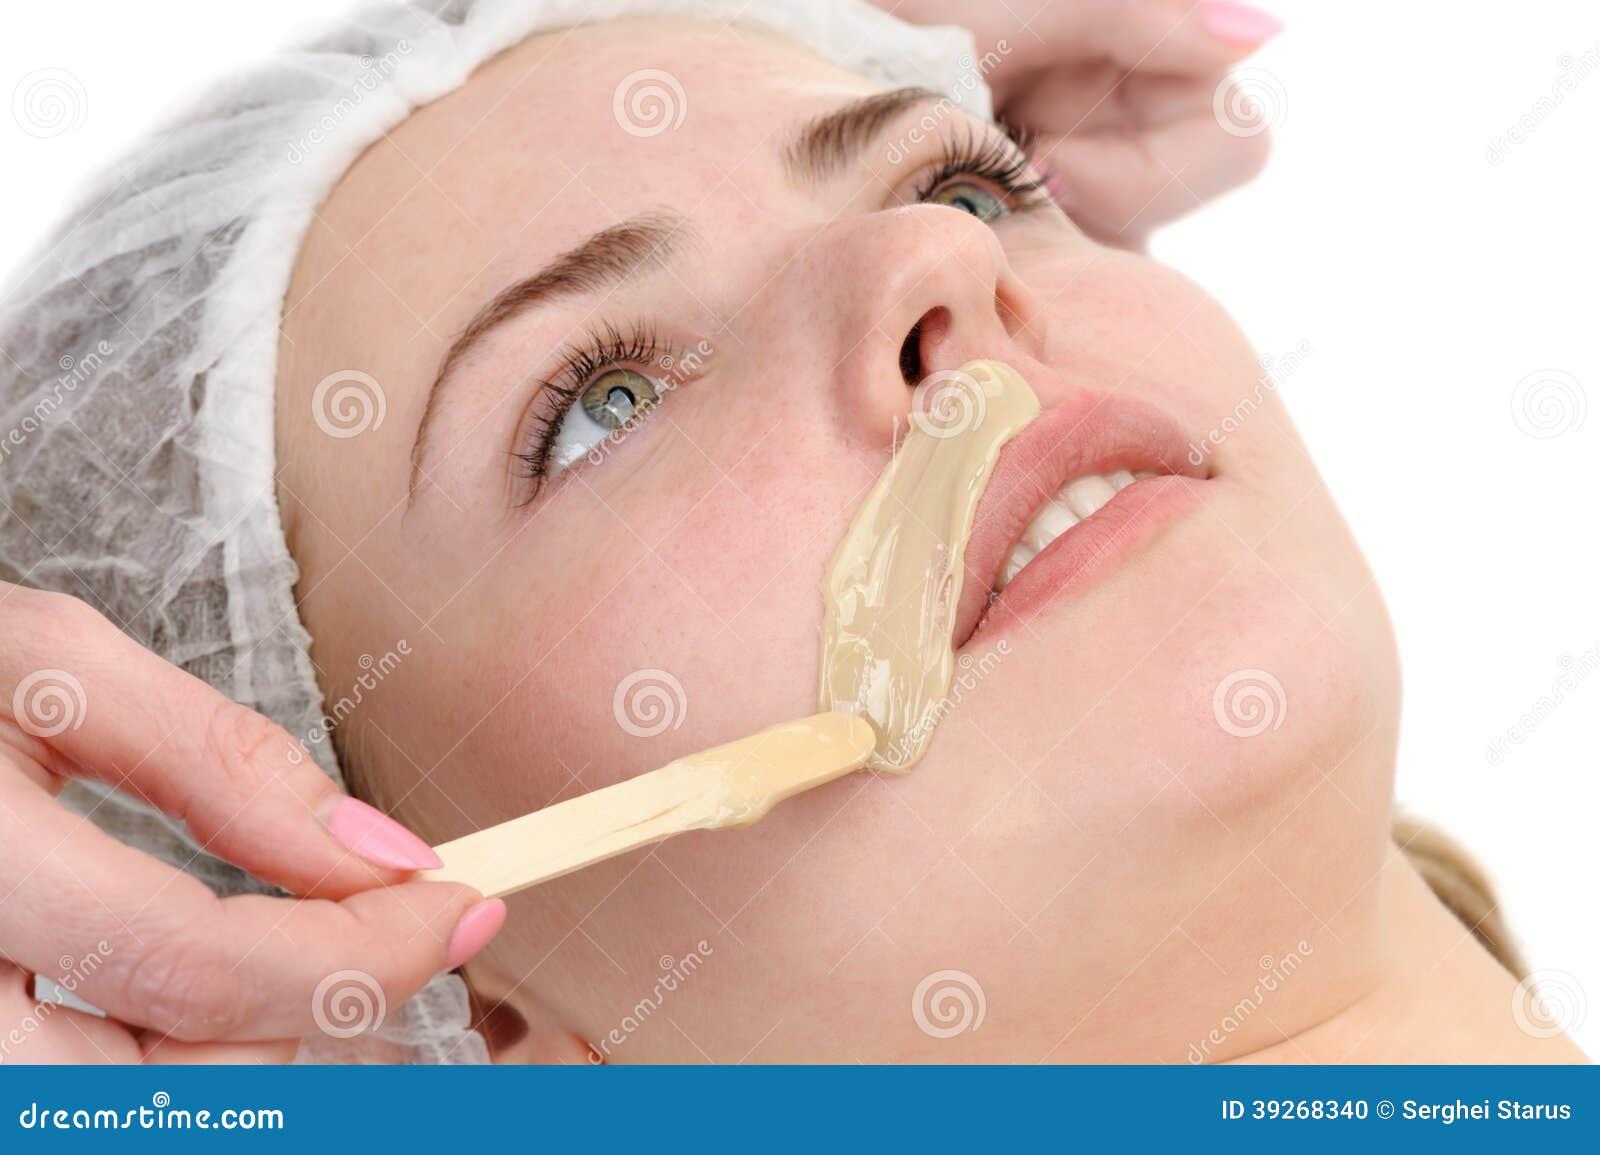 Beauty salon, mustache depilation, facial skin treatment and care ...